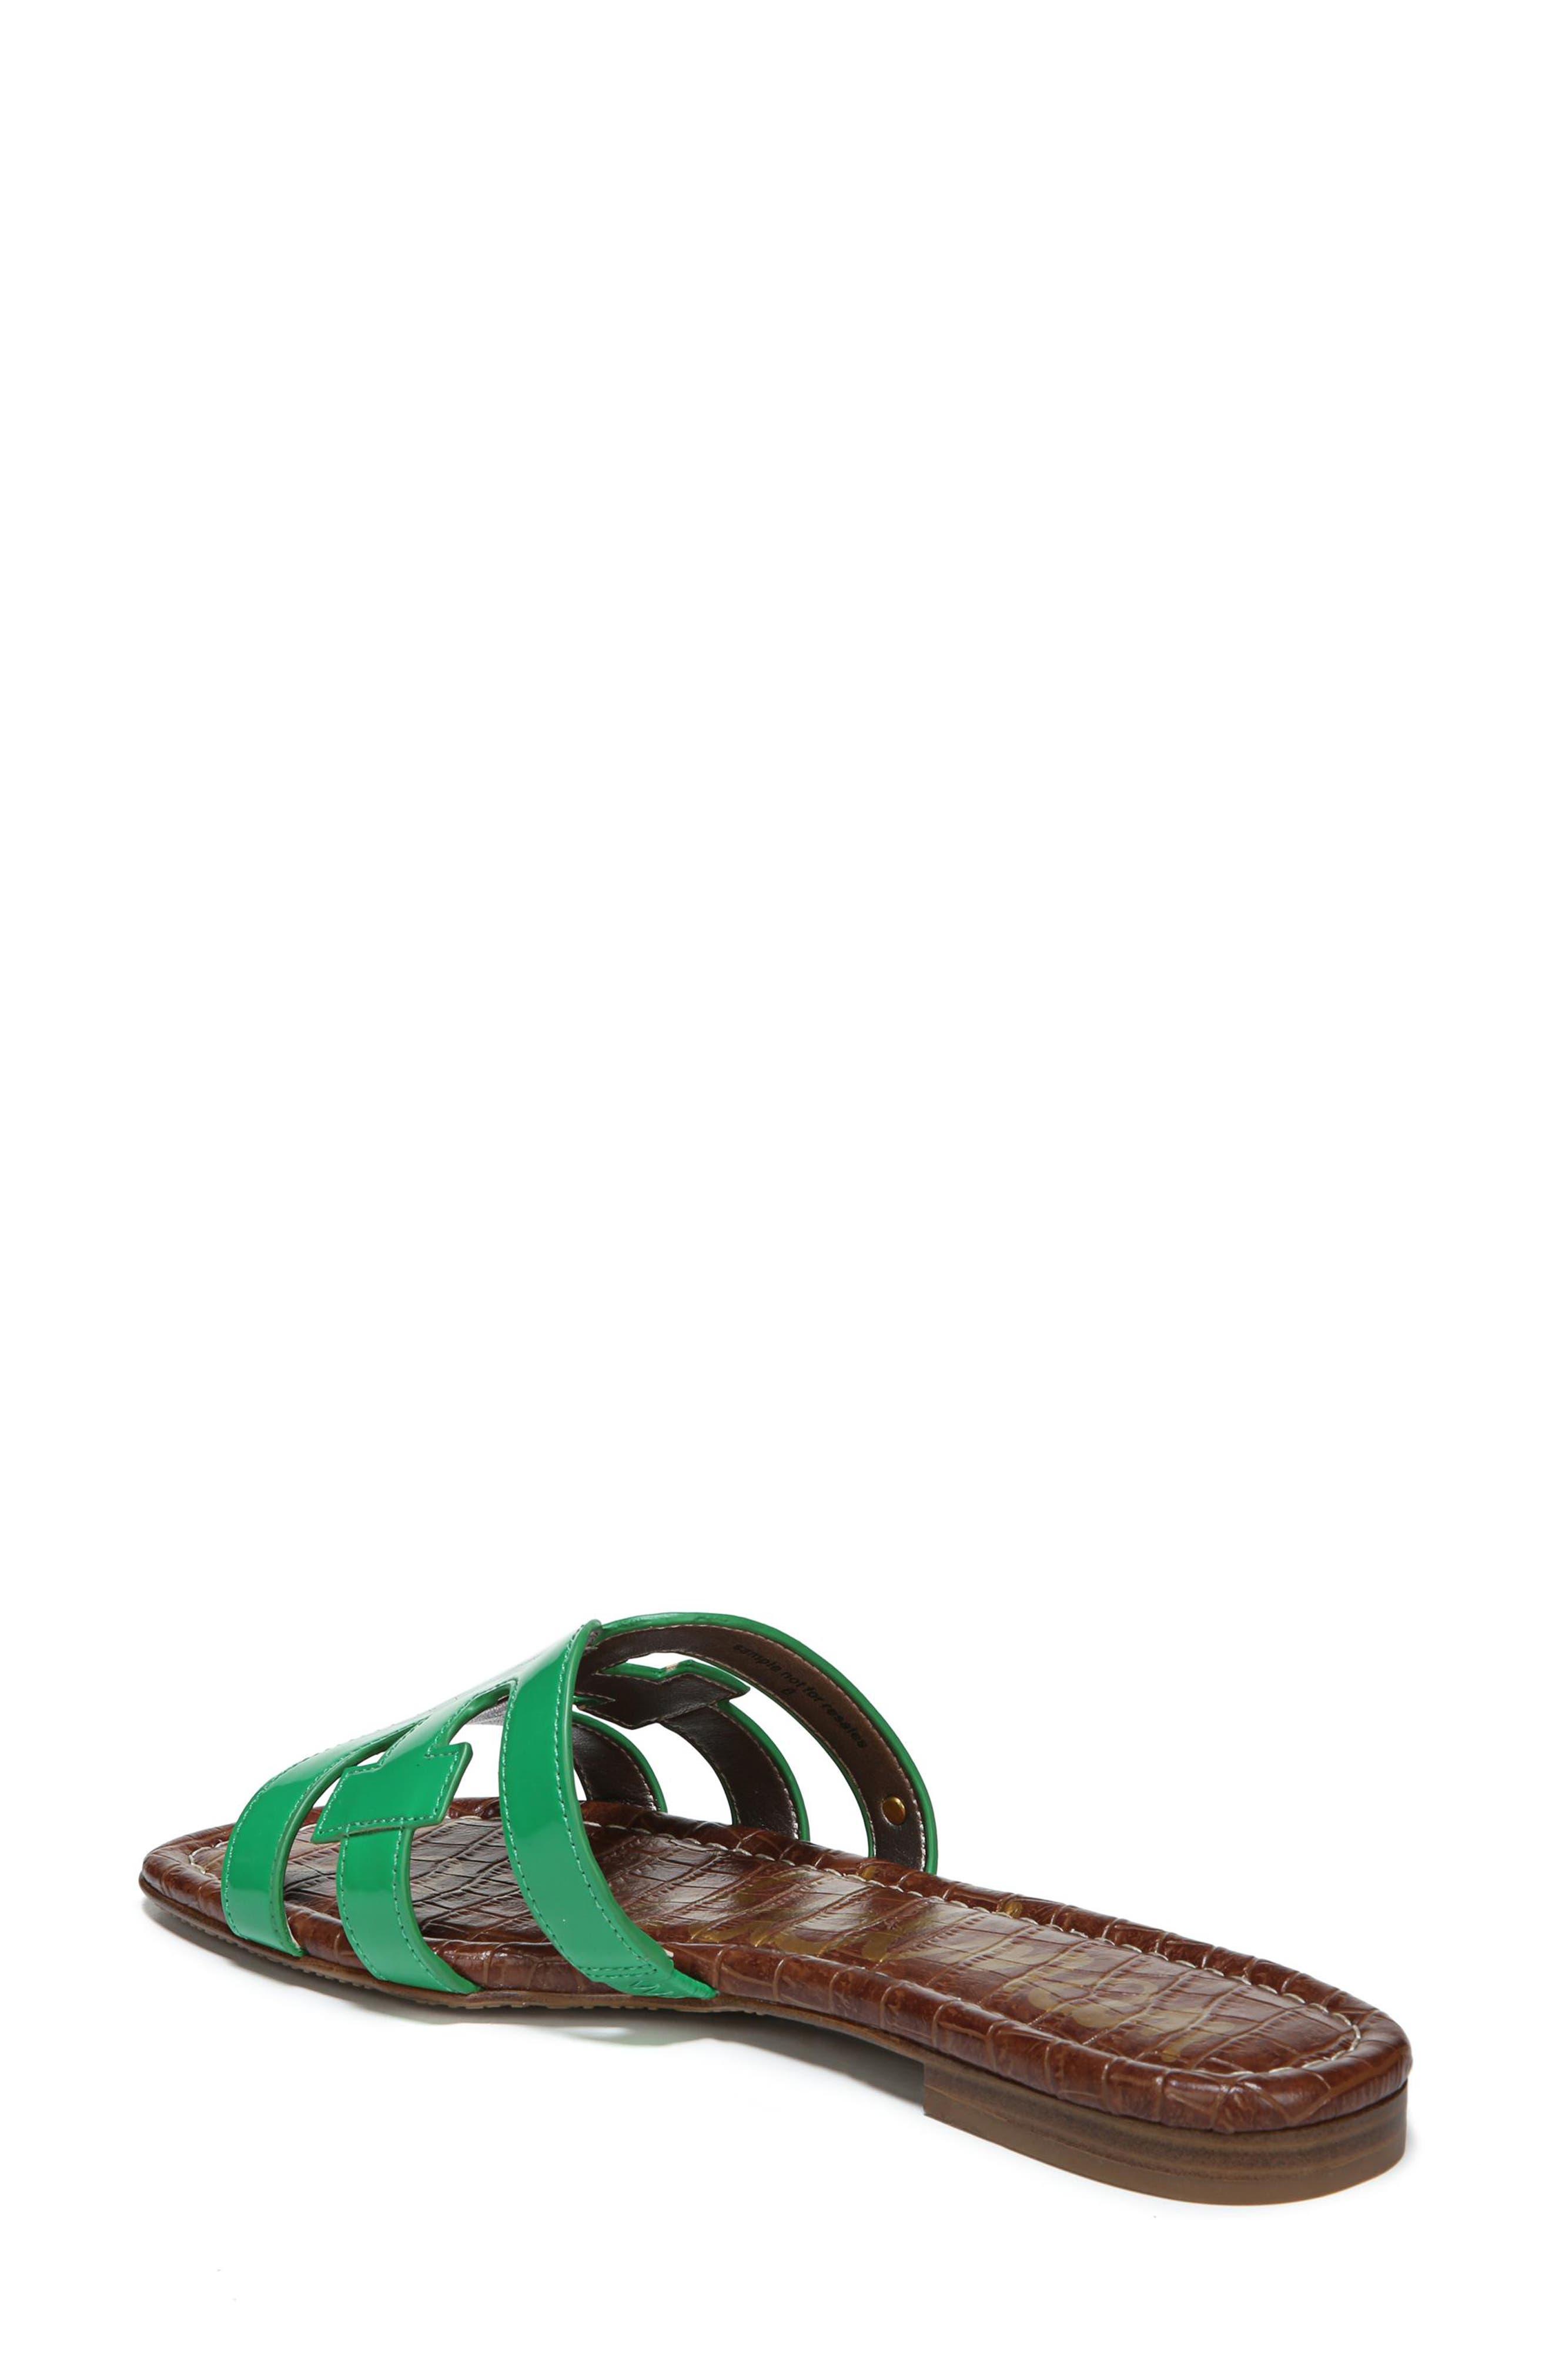 Bay Cutout Slide Sandal,                             Alternate thumbnail 2, color,                             LEAF GREEN PATENT LEATHER